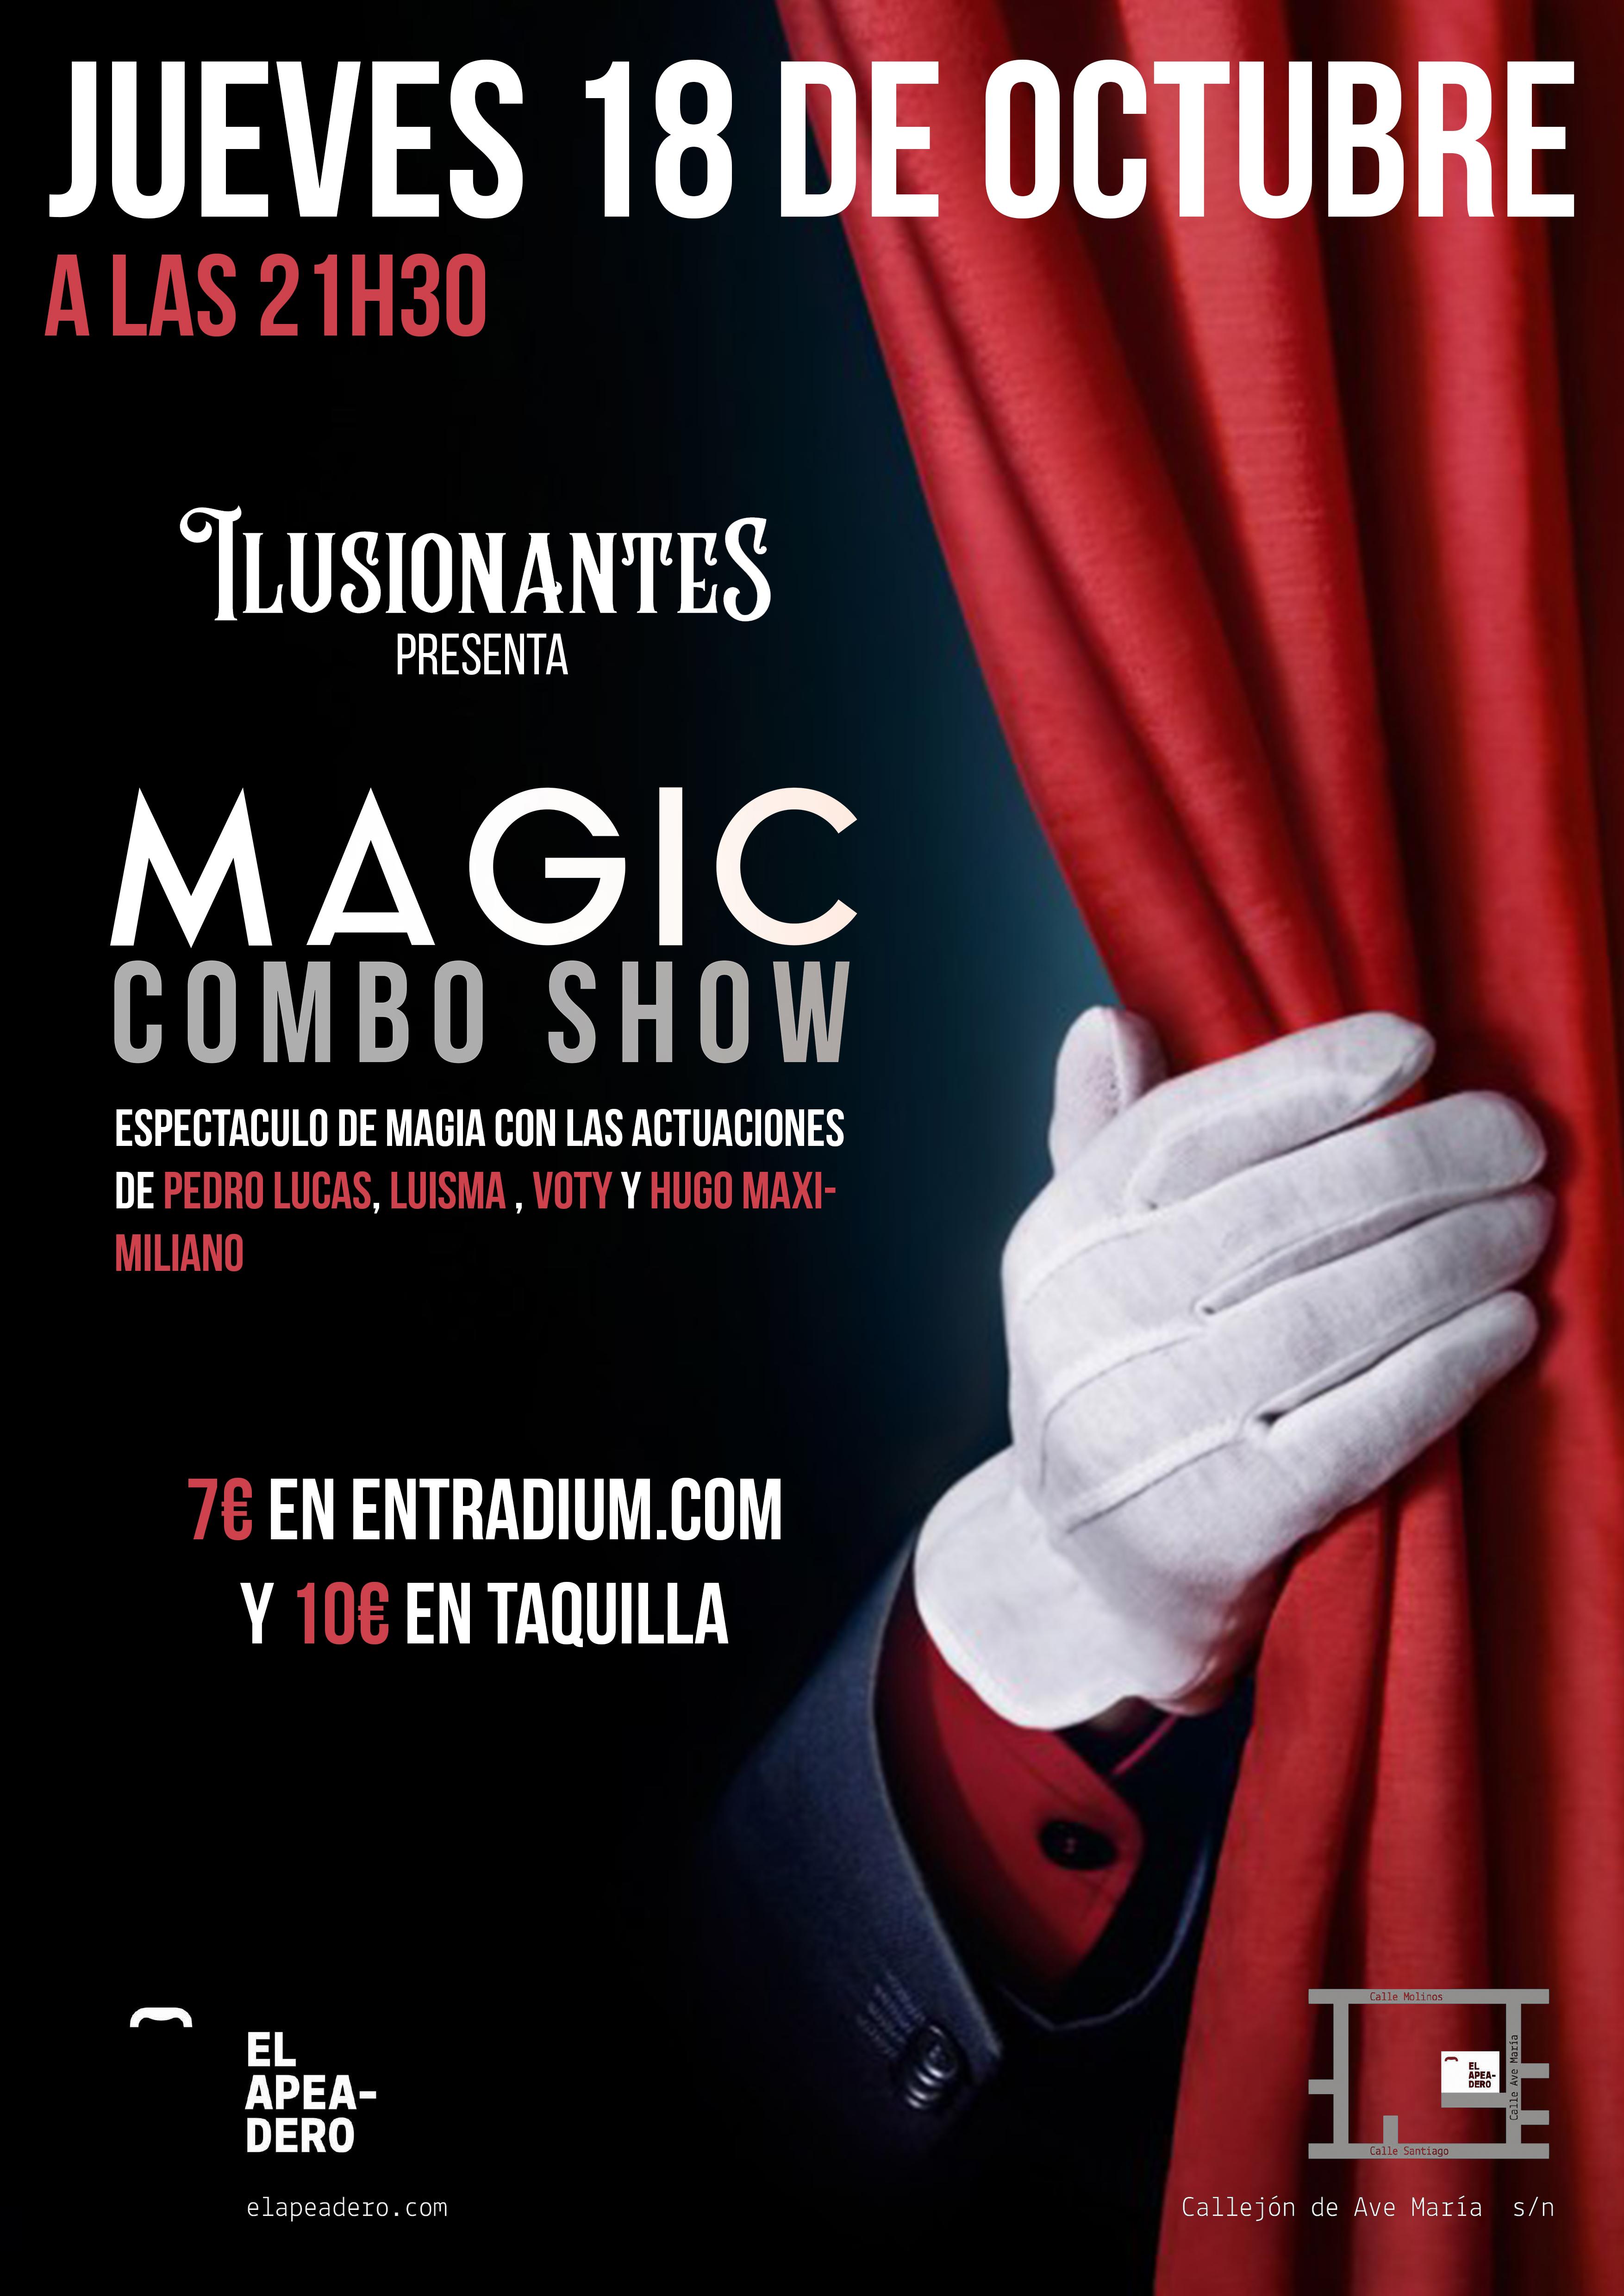 Magic Combo Show - Octubre 2018 - Magic Combo Show - Octubre 2018